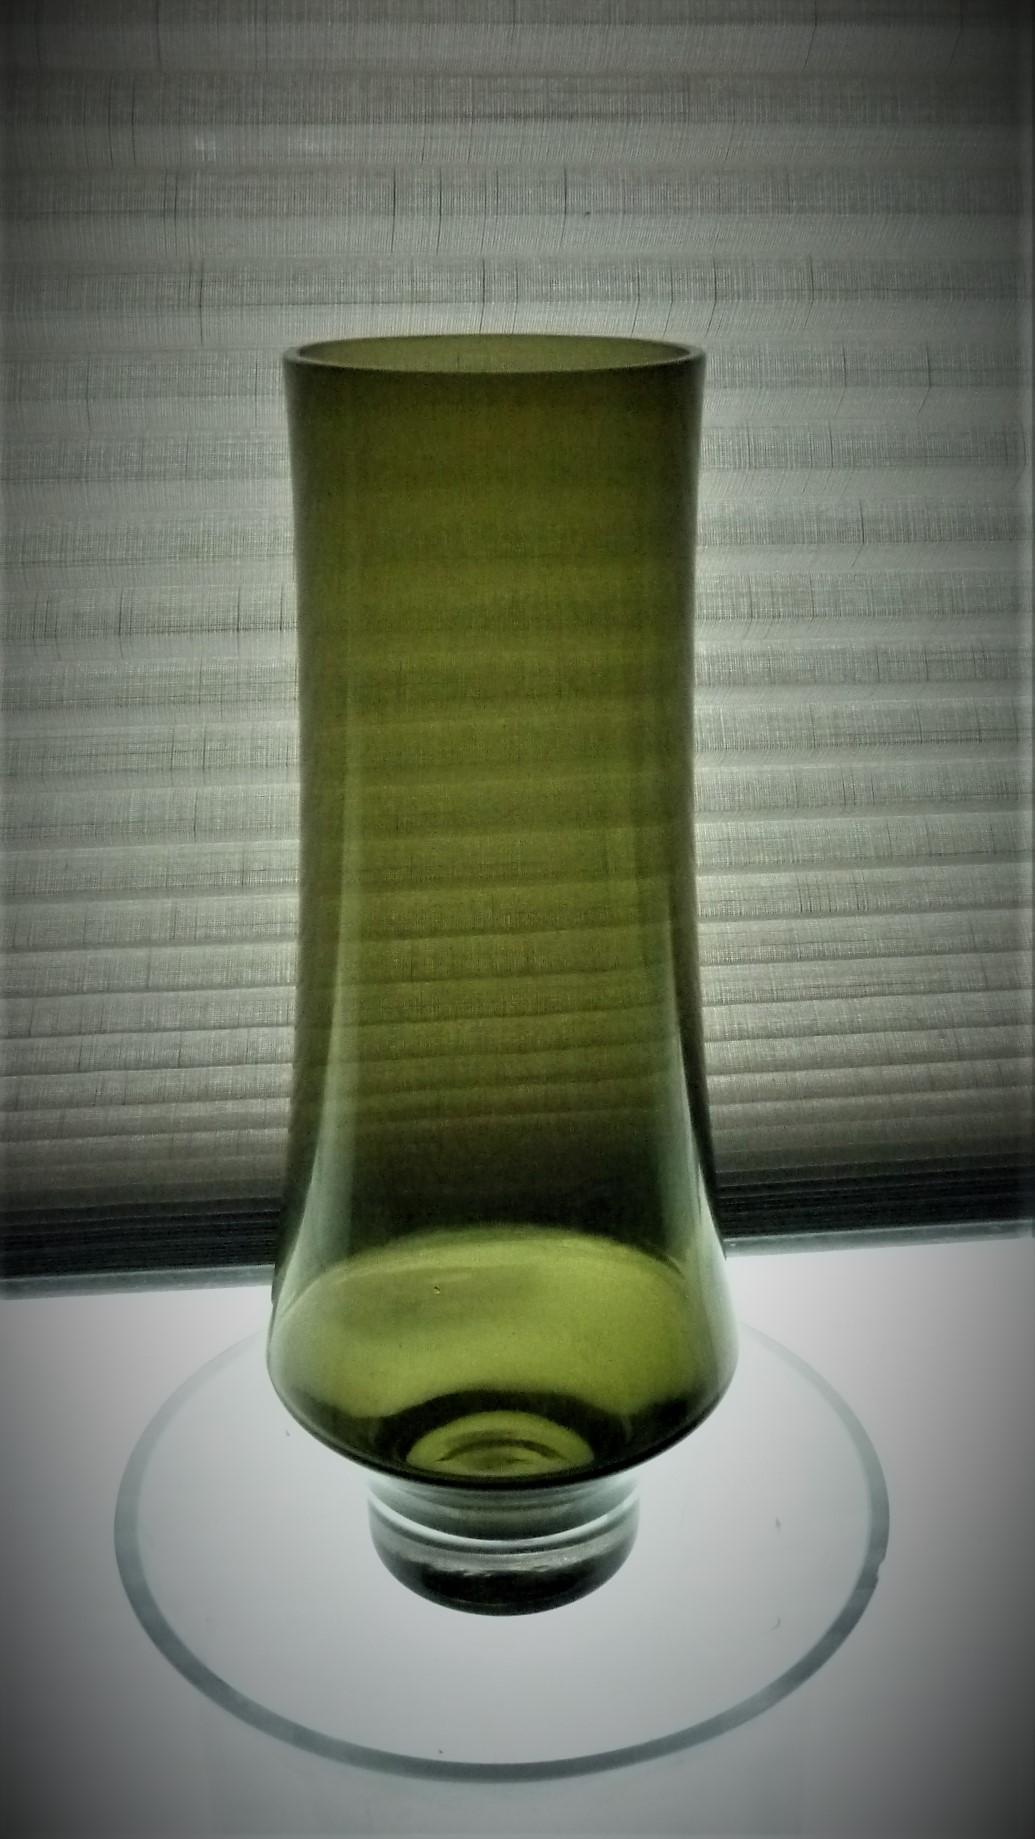 Vintage 1963 Tamara Aladin Riihimaen Lasi green glass vase Pattern No. 1374